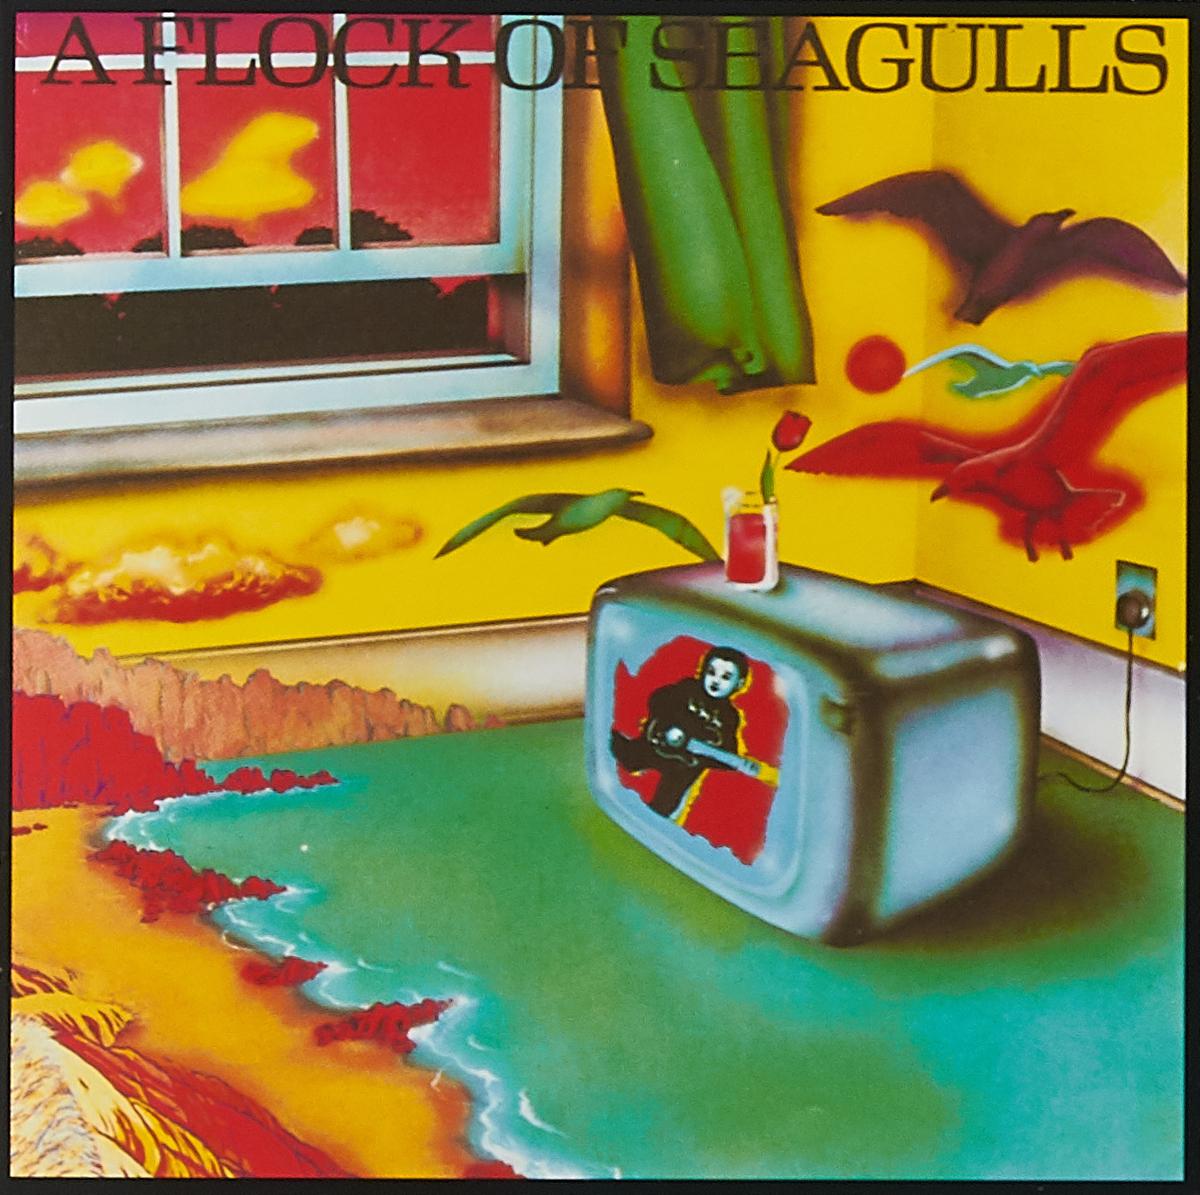 A Flock Of Seagulls A Flock Of Seagulls. A Flock Of Seagulls